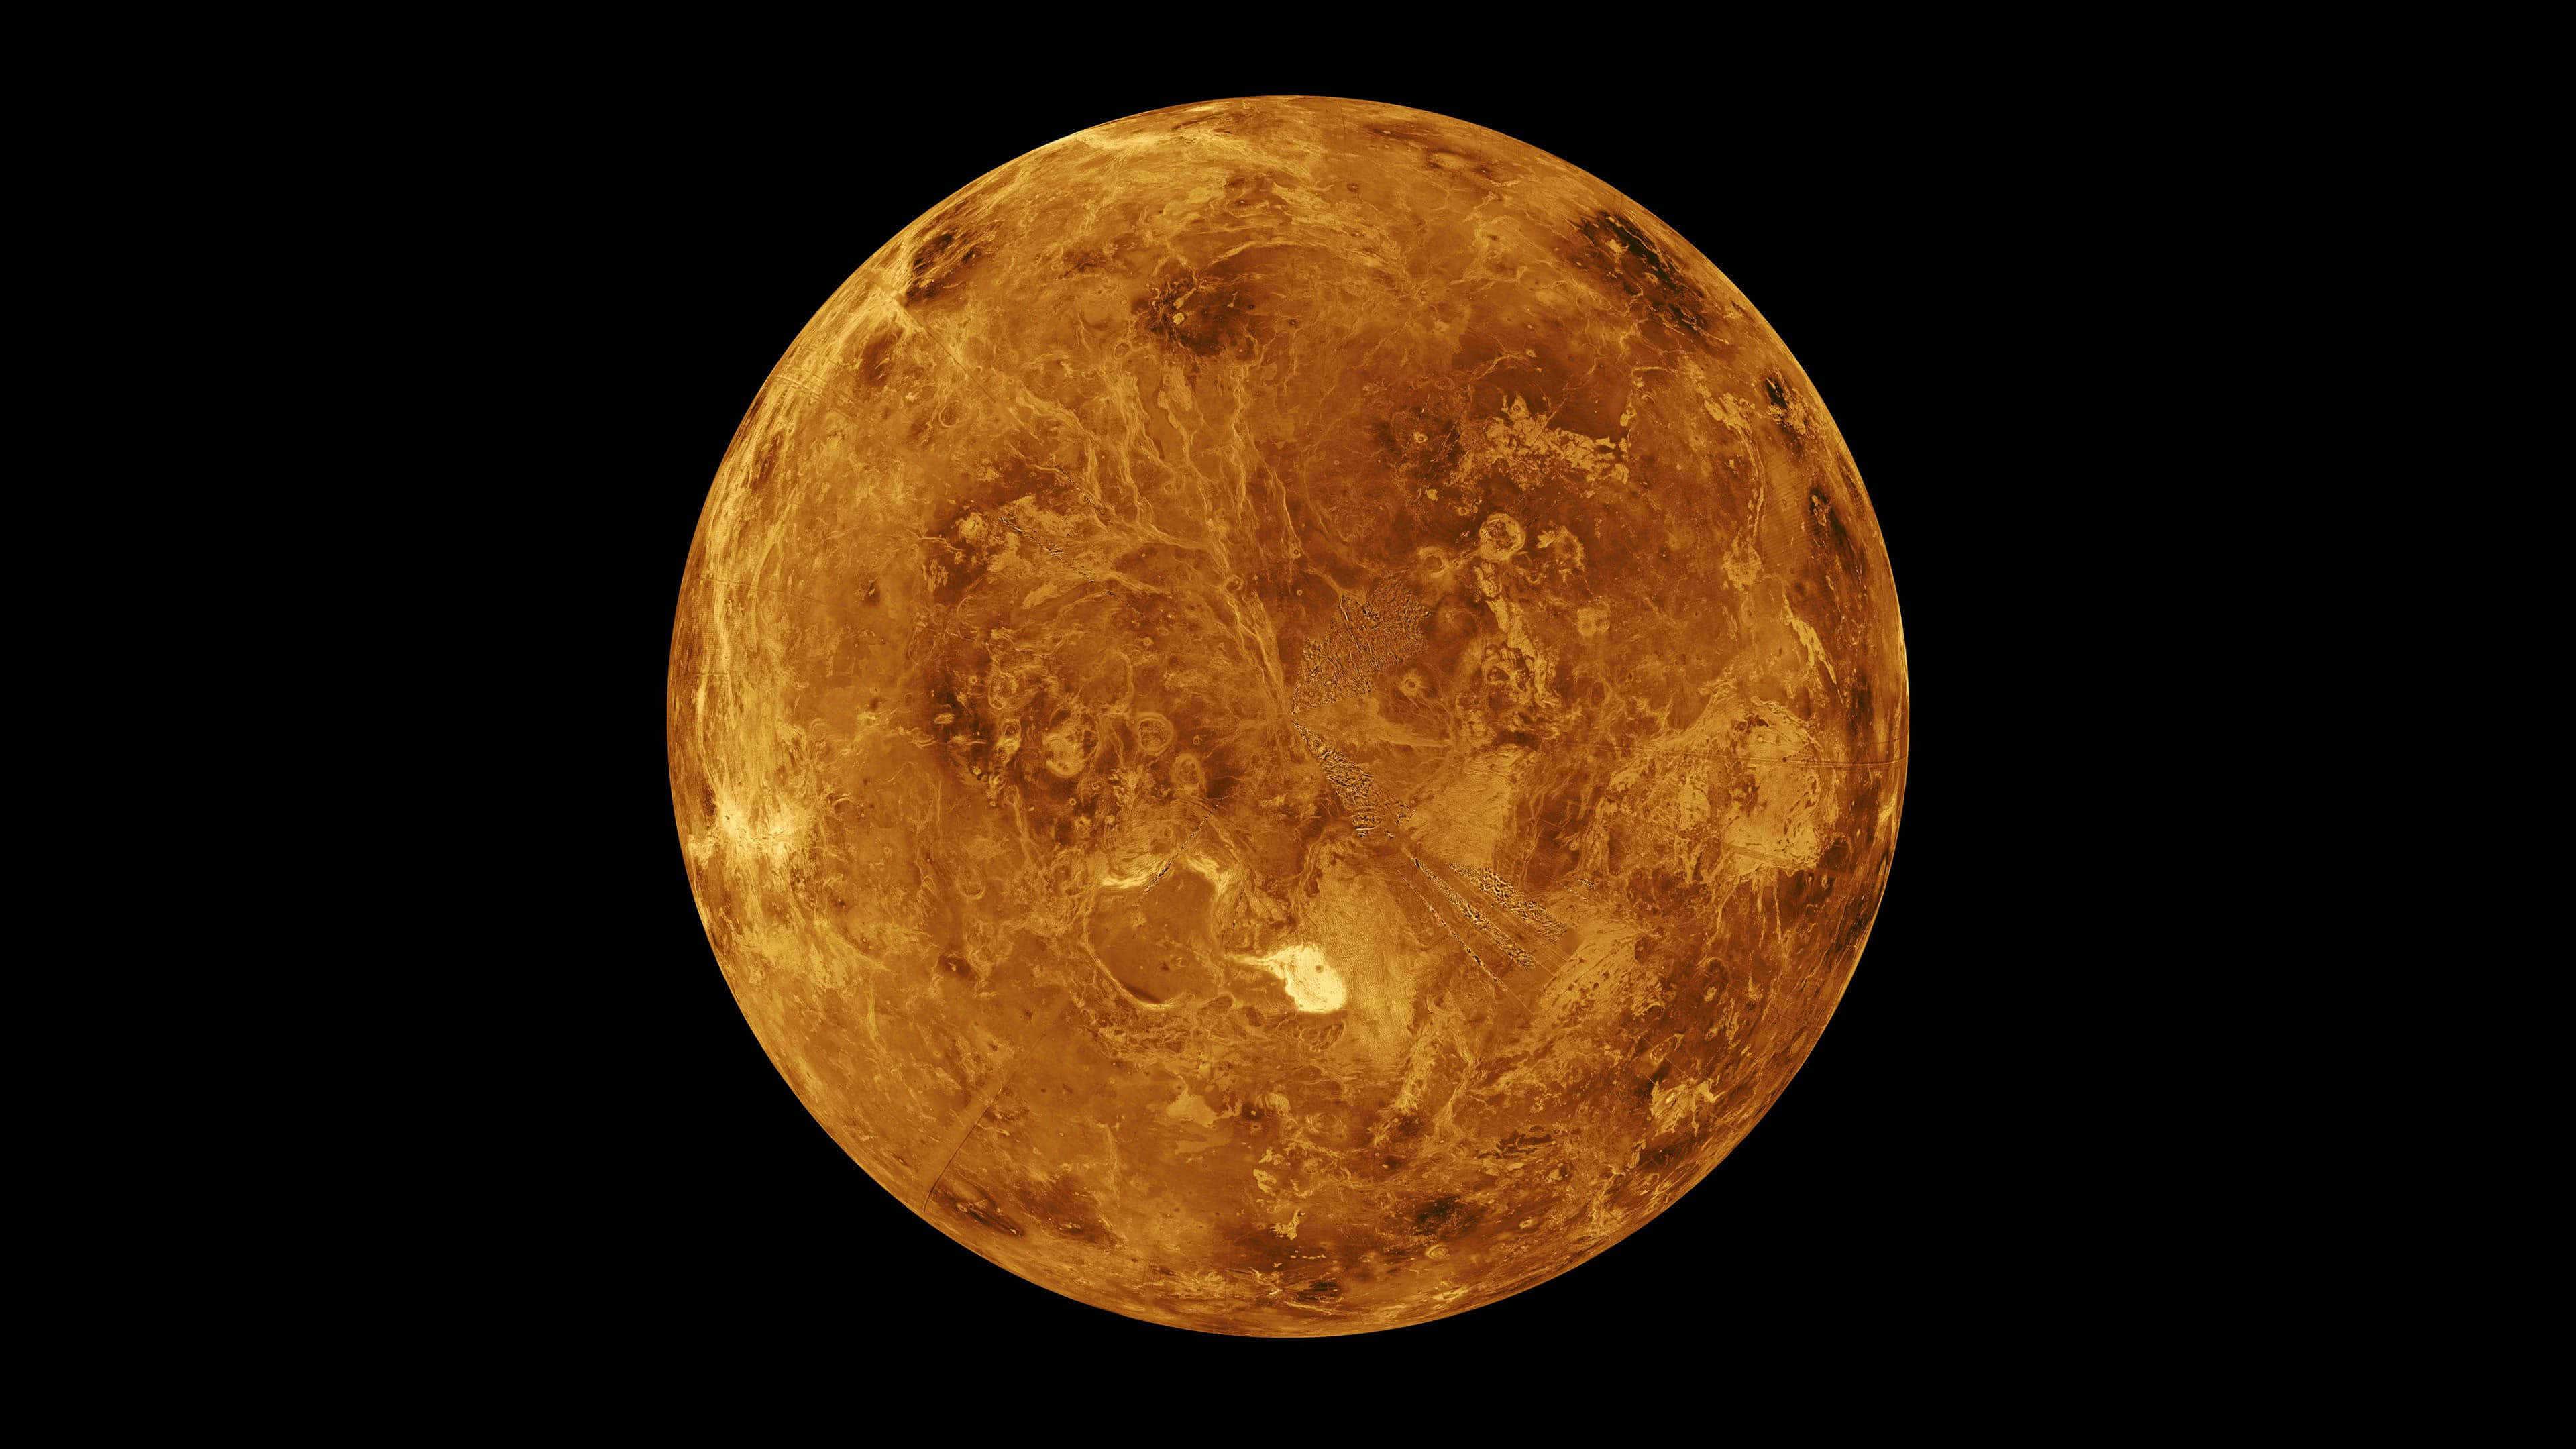 Mercury's equatorial circumference is 15,329 km.